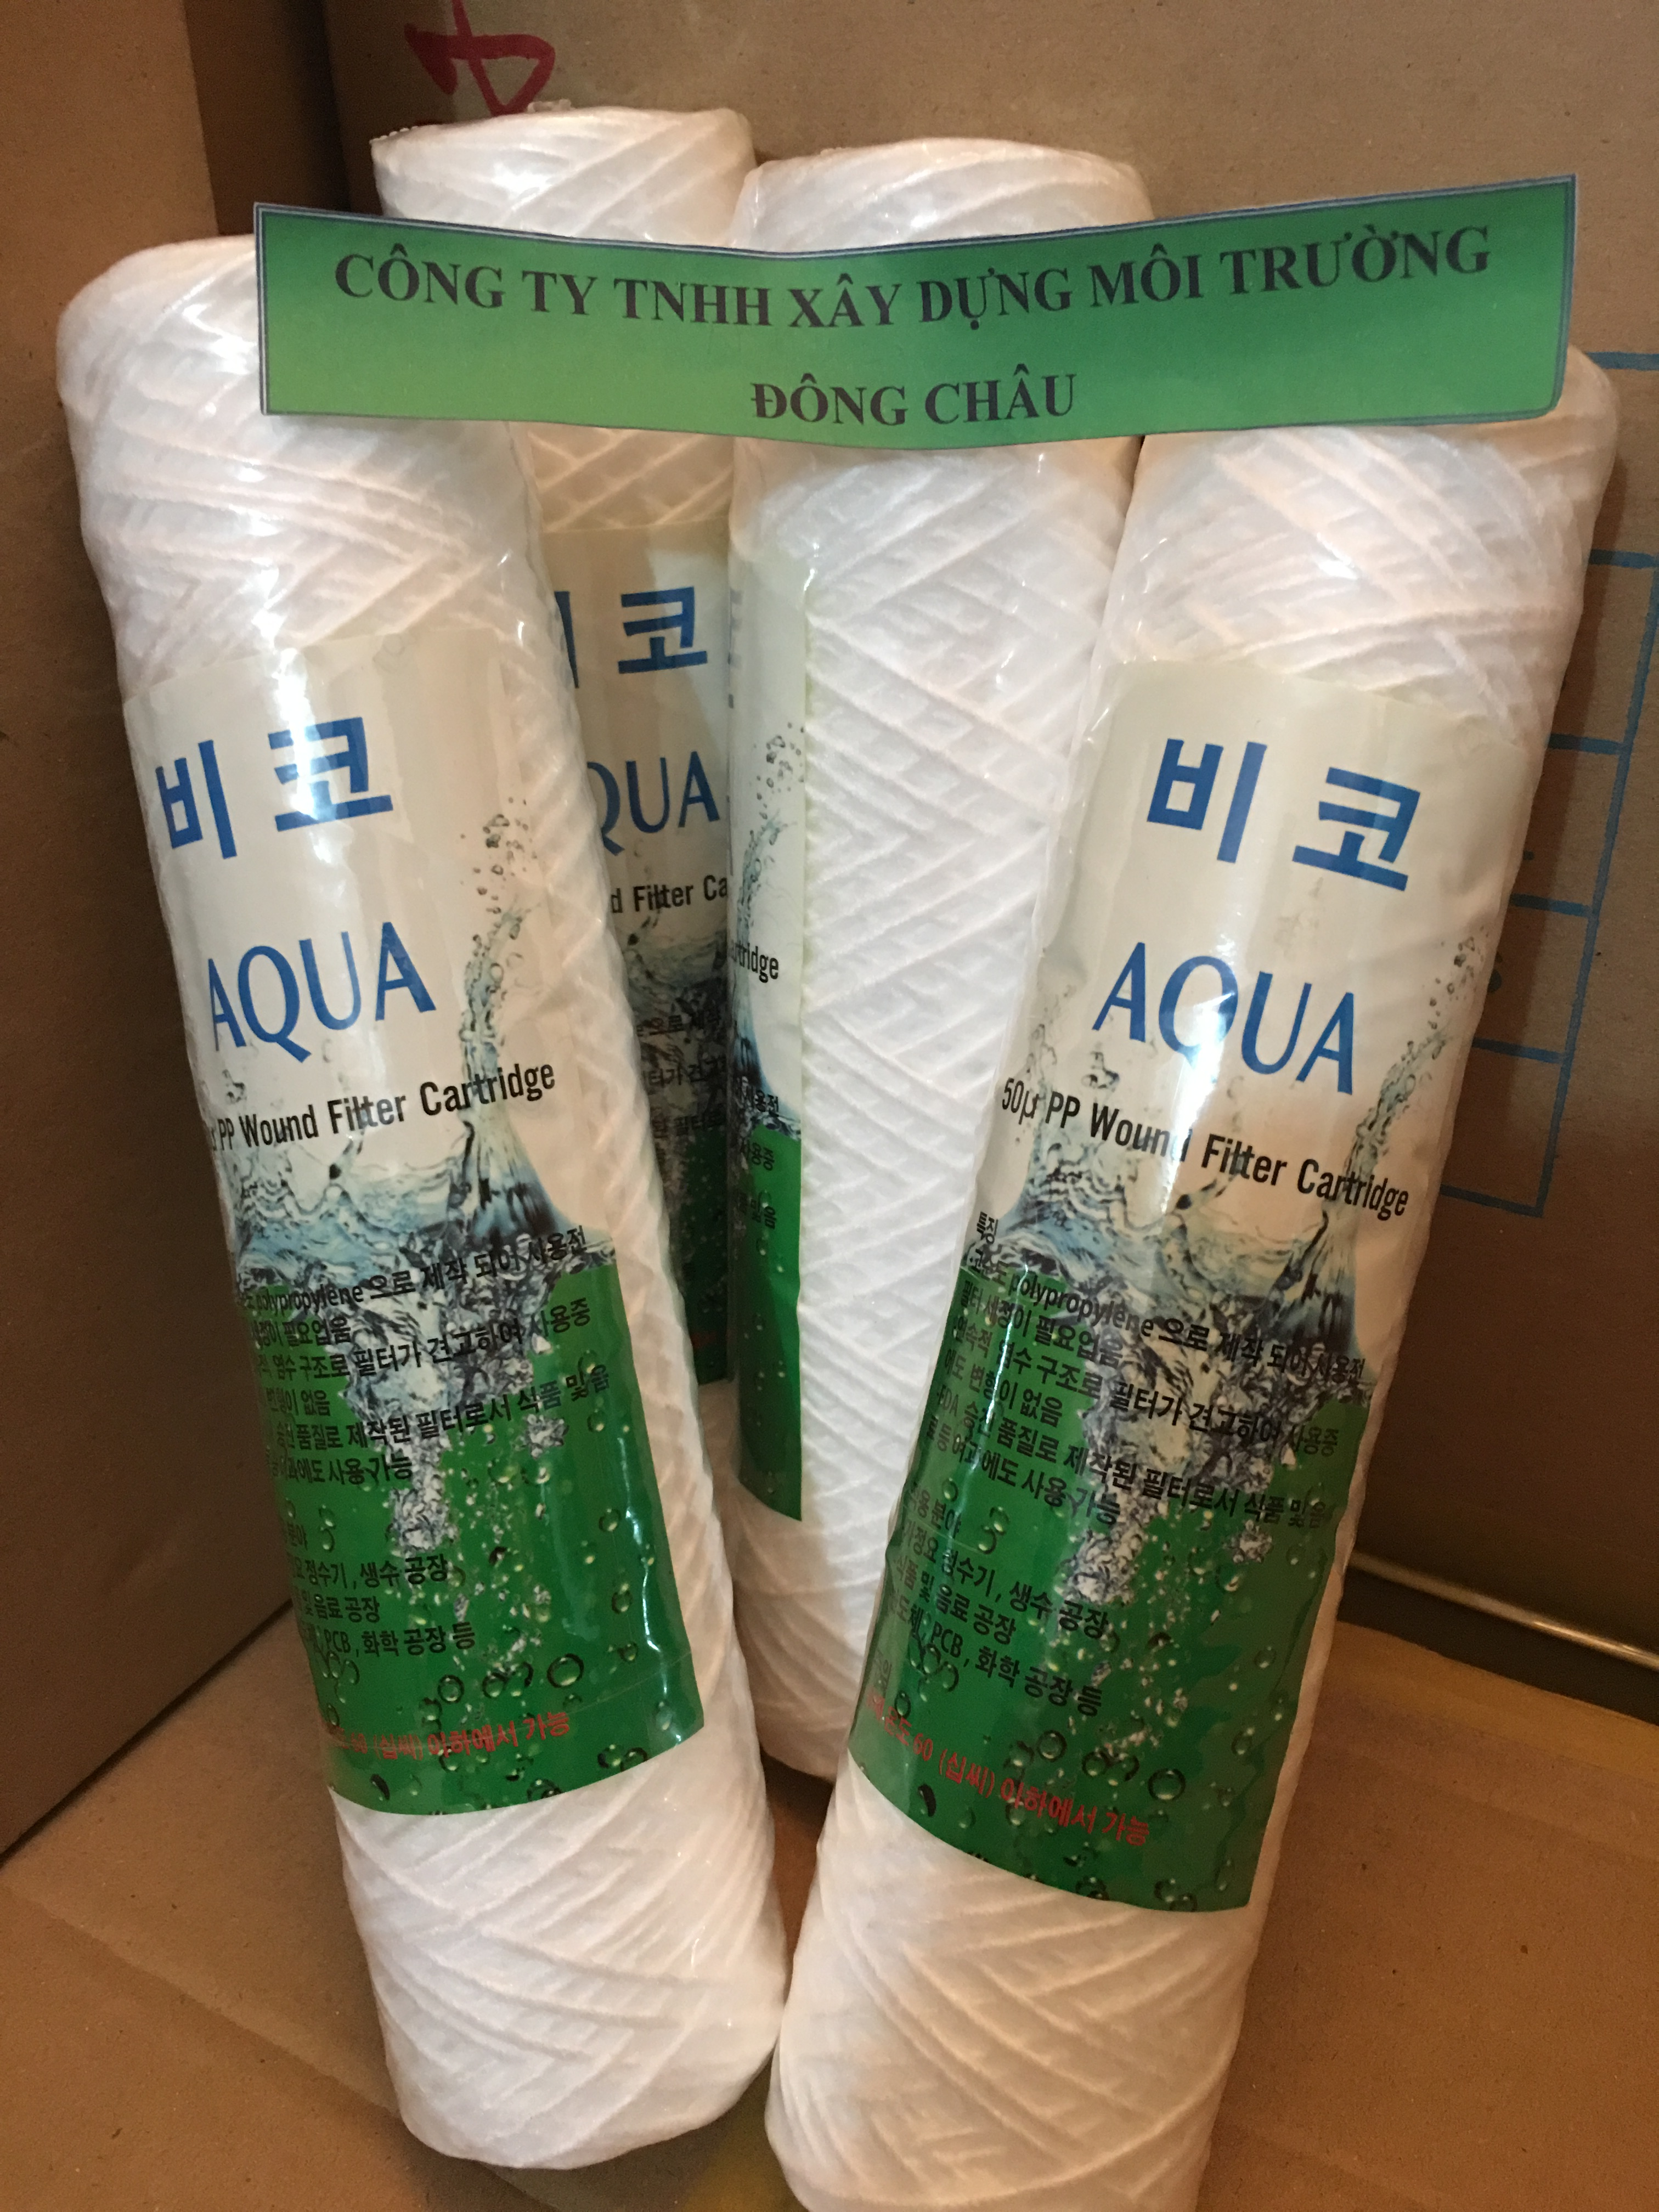 Lõi lọc sợi Aqua 50 micron 10 inch